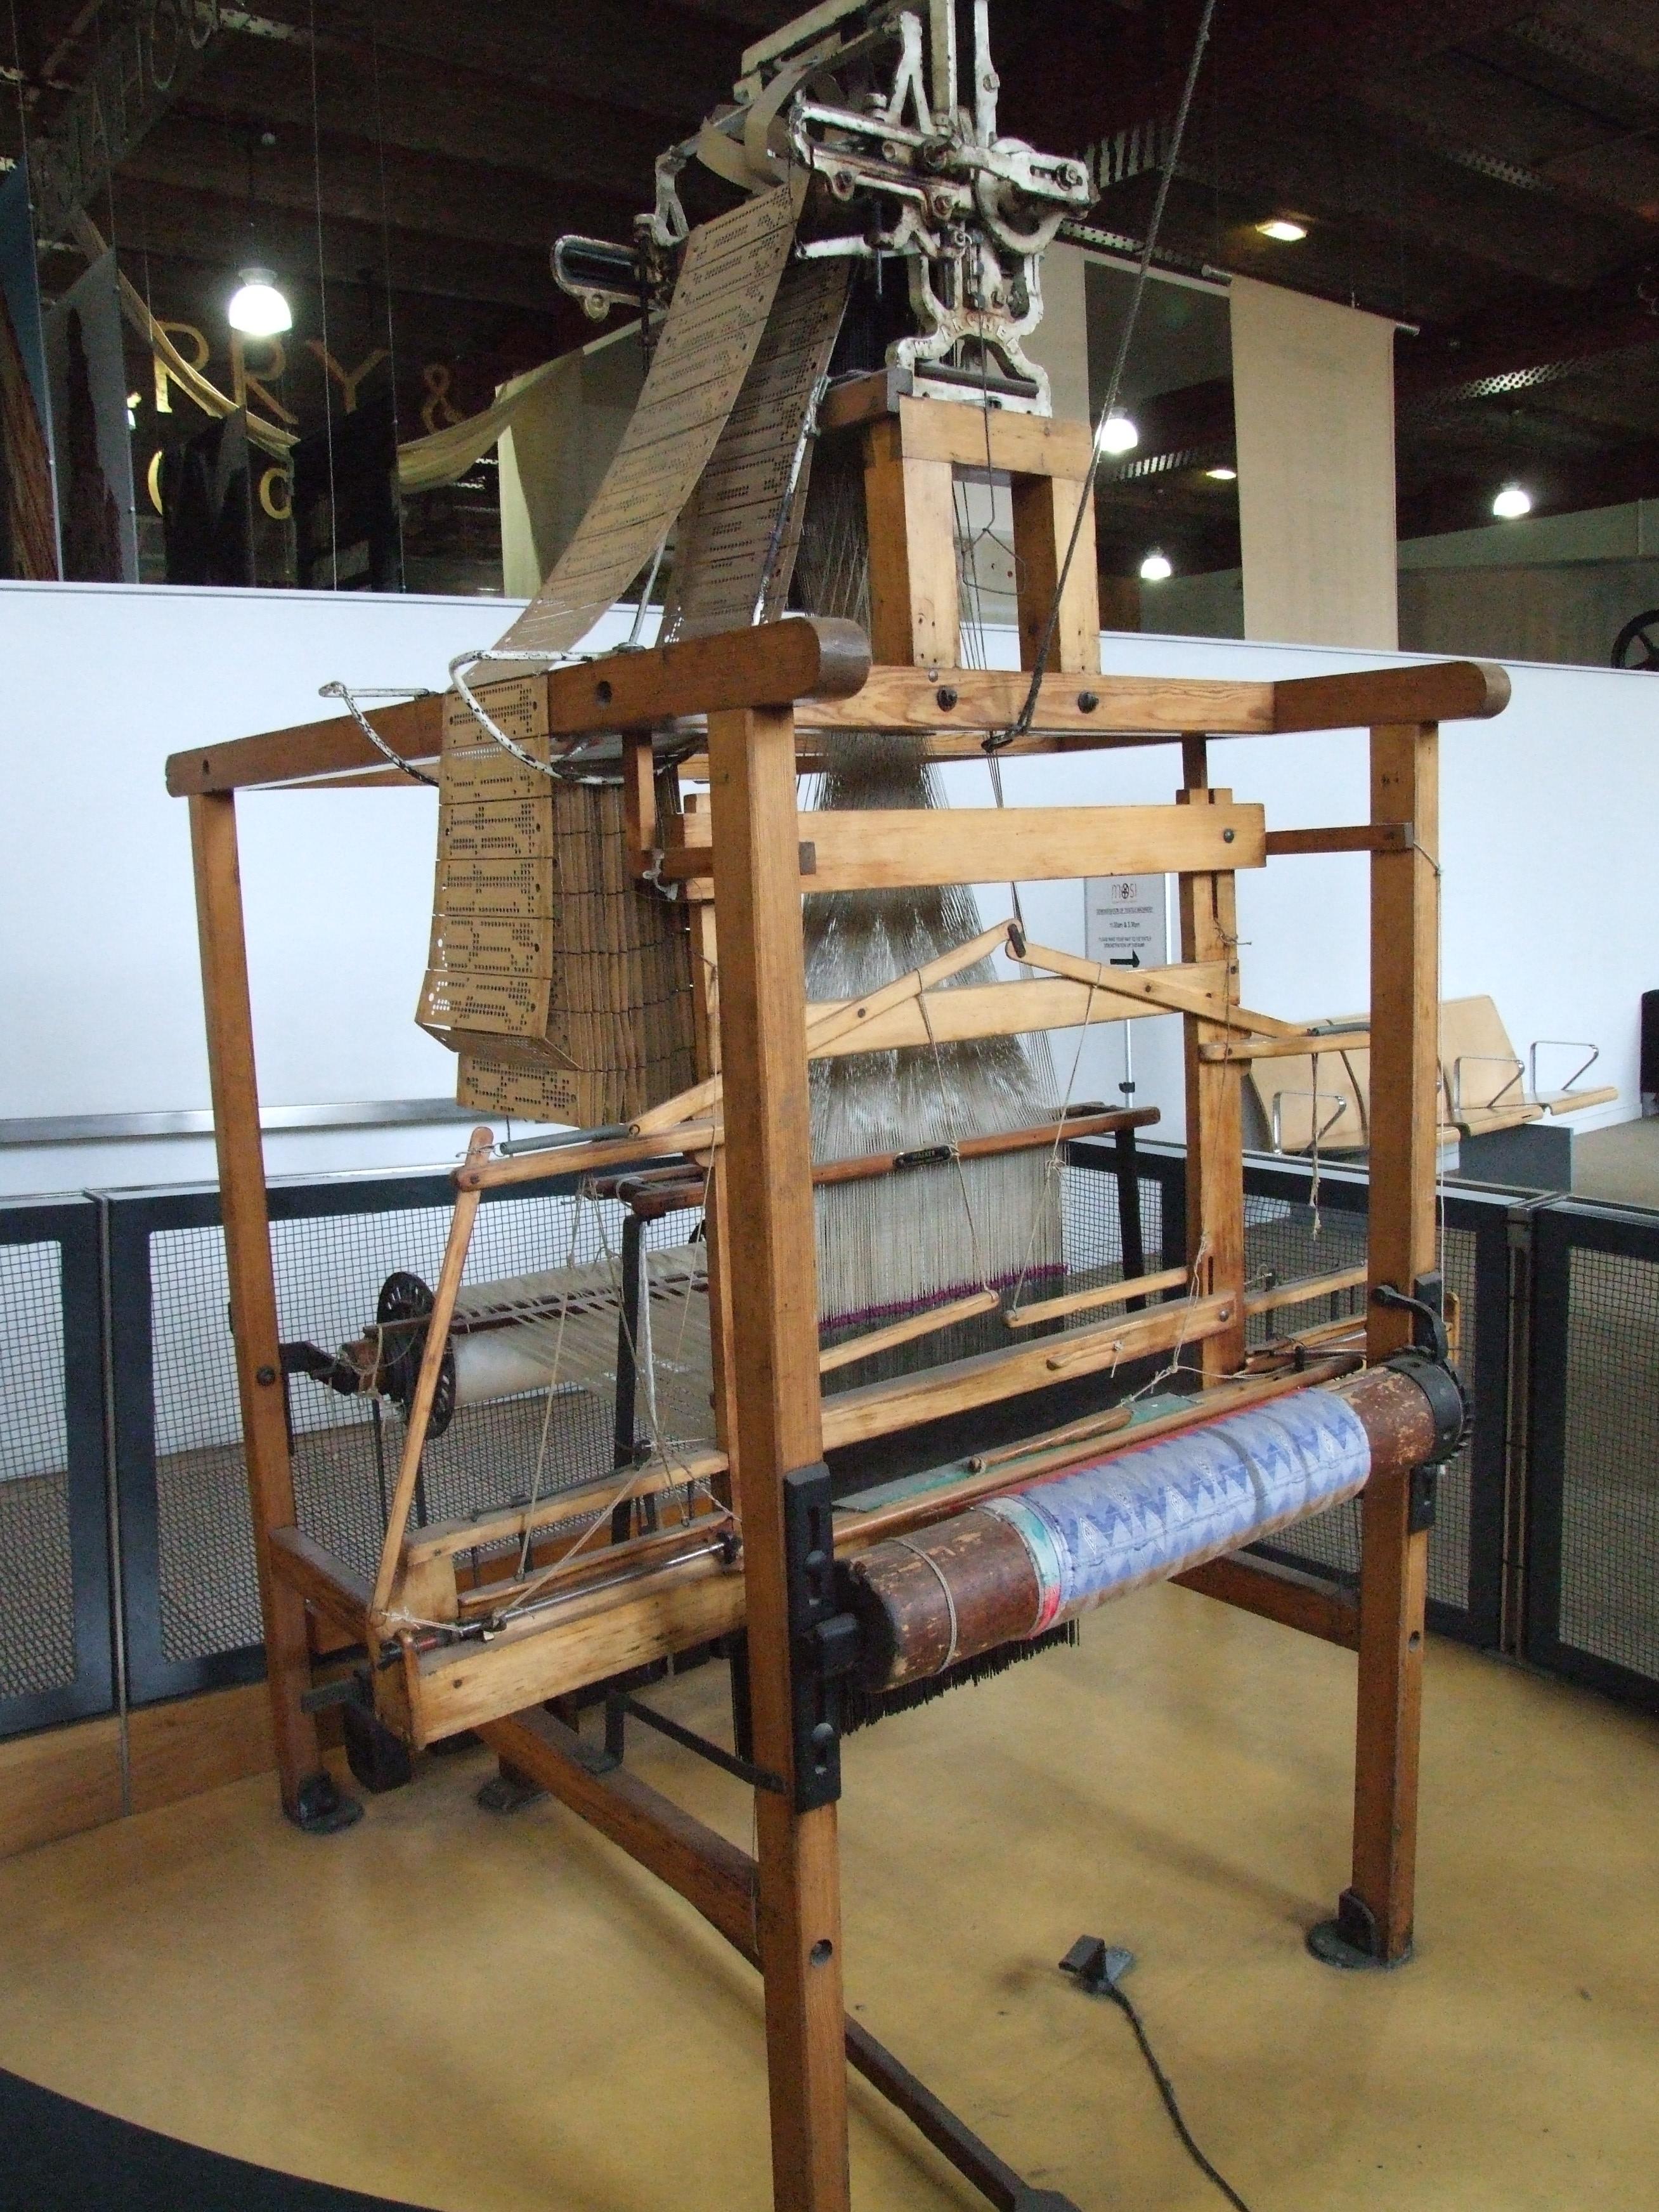 File:Wooden Jacquard loom MOSI-11 5544.JPG - Wikimedia Commons